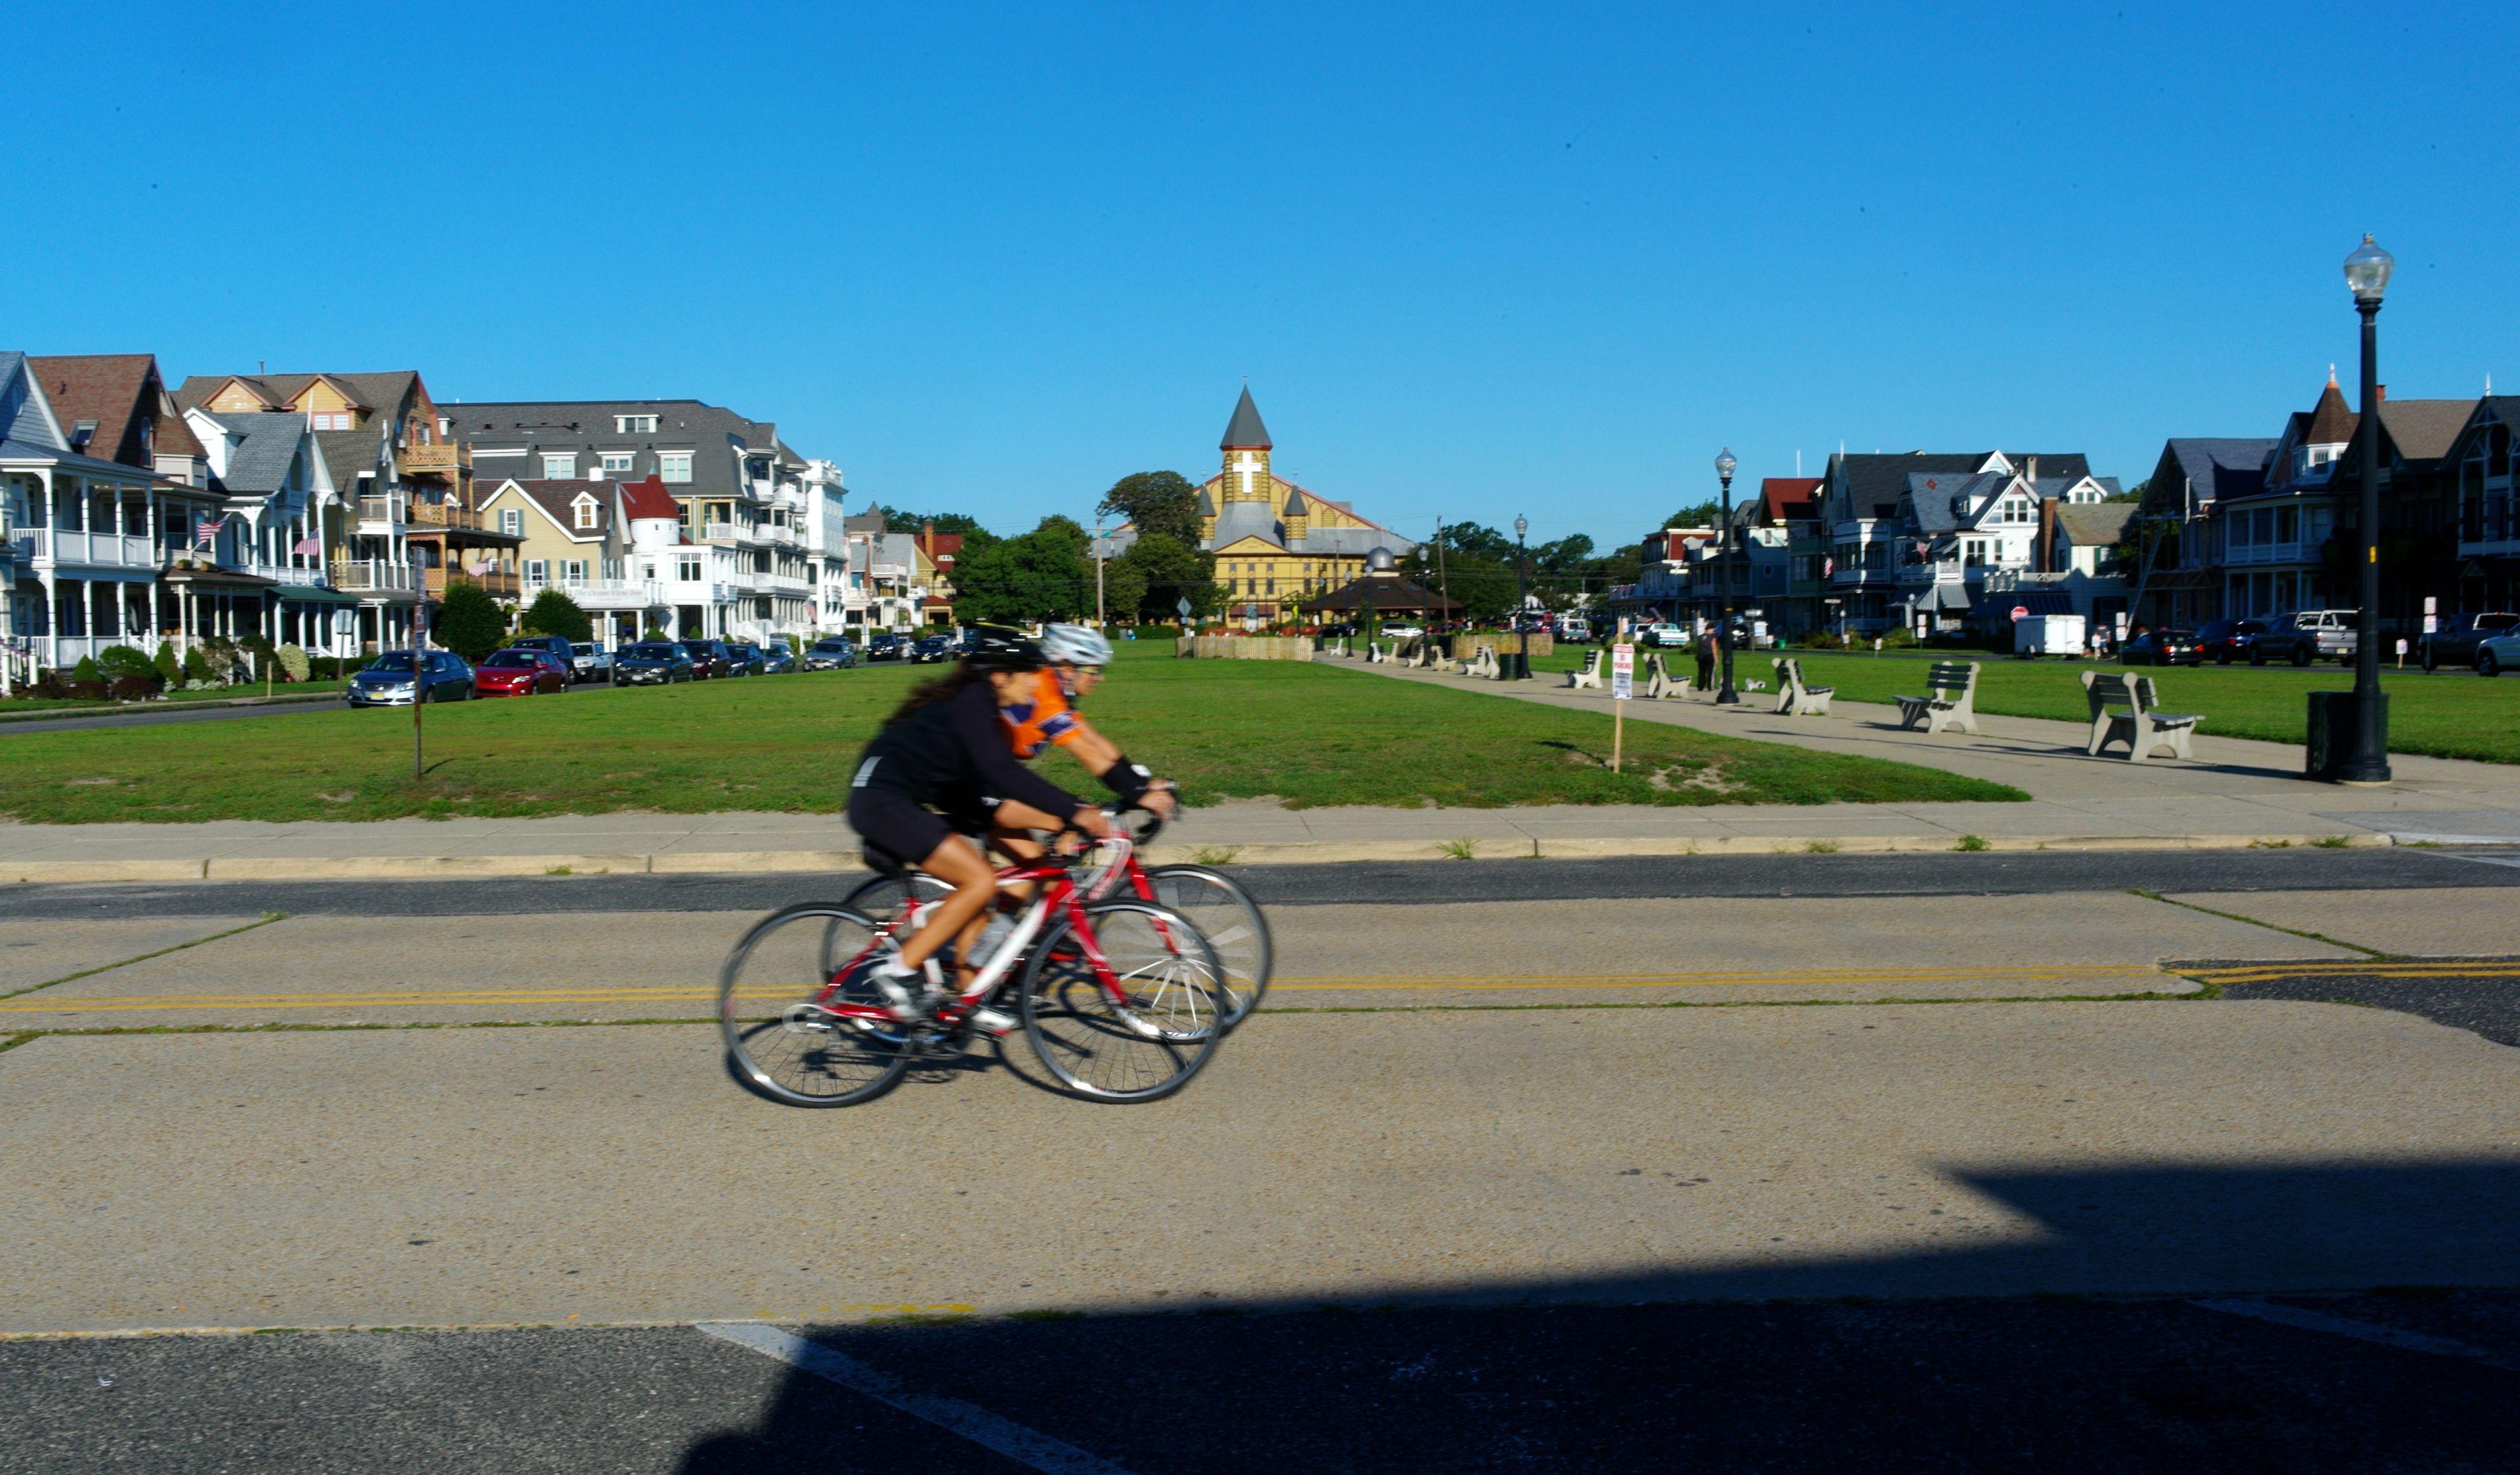 Bikers whiz by an empty Ocean Pathway Paul Goldfinger photo Sept 4 8:30 am ©